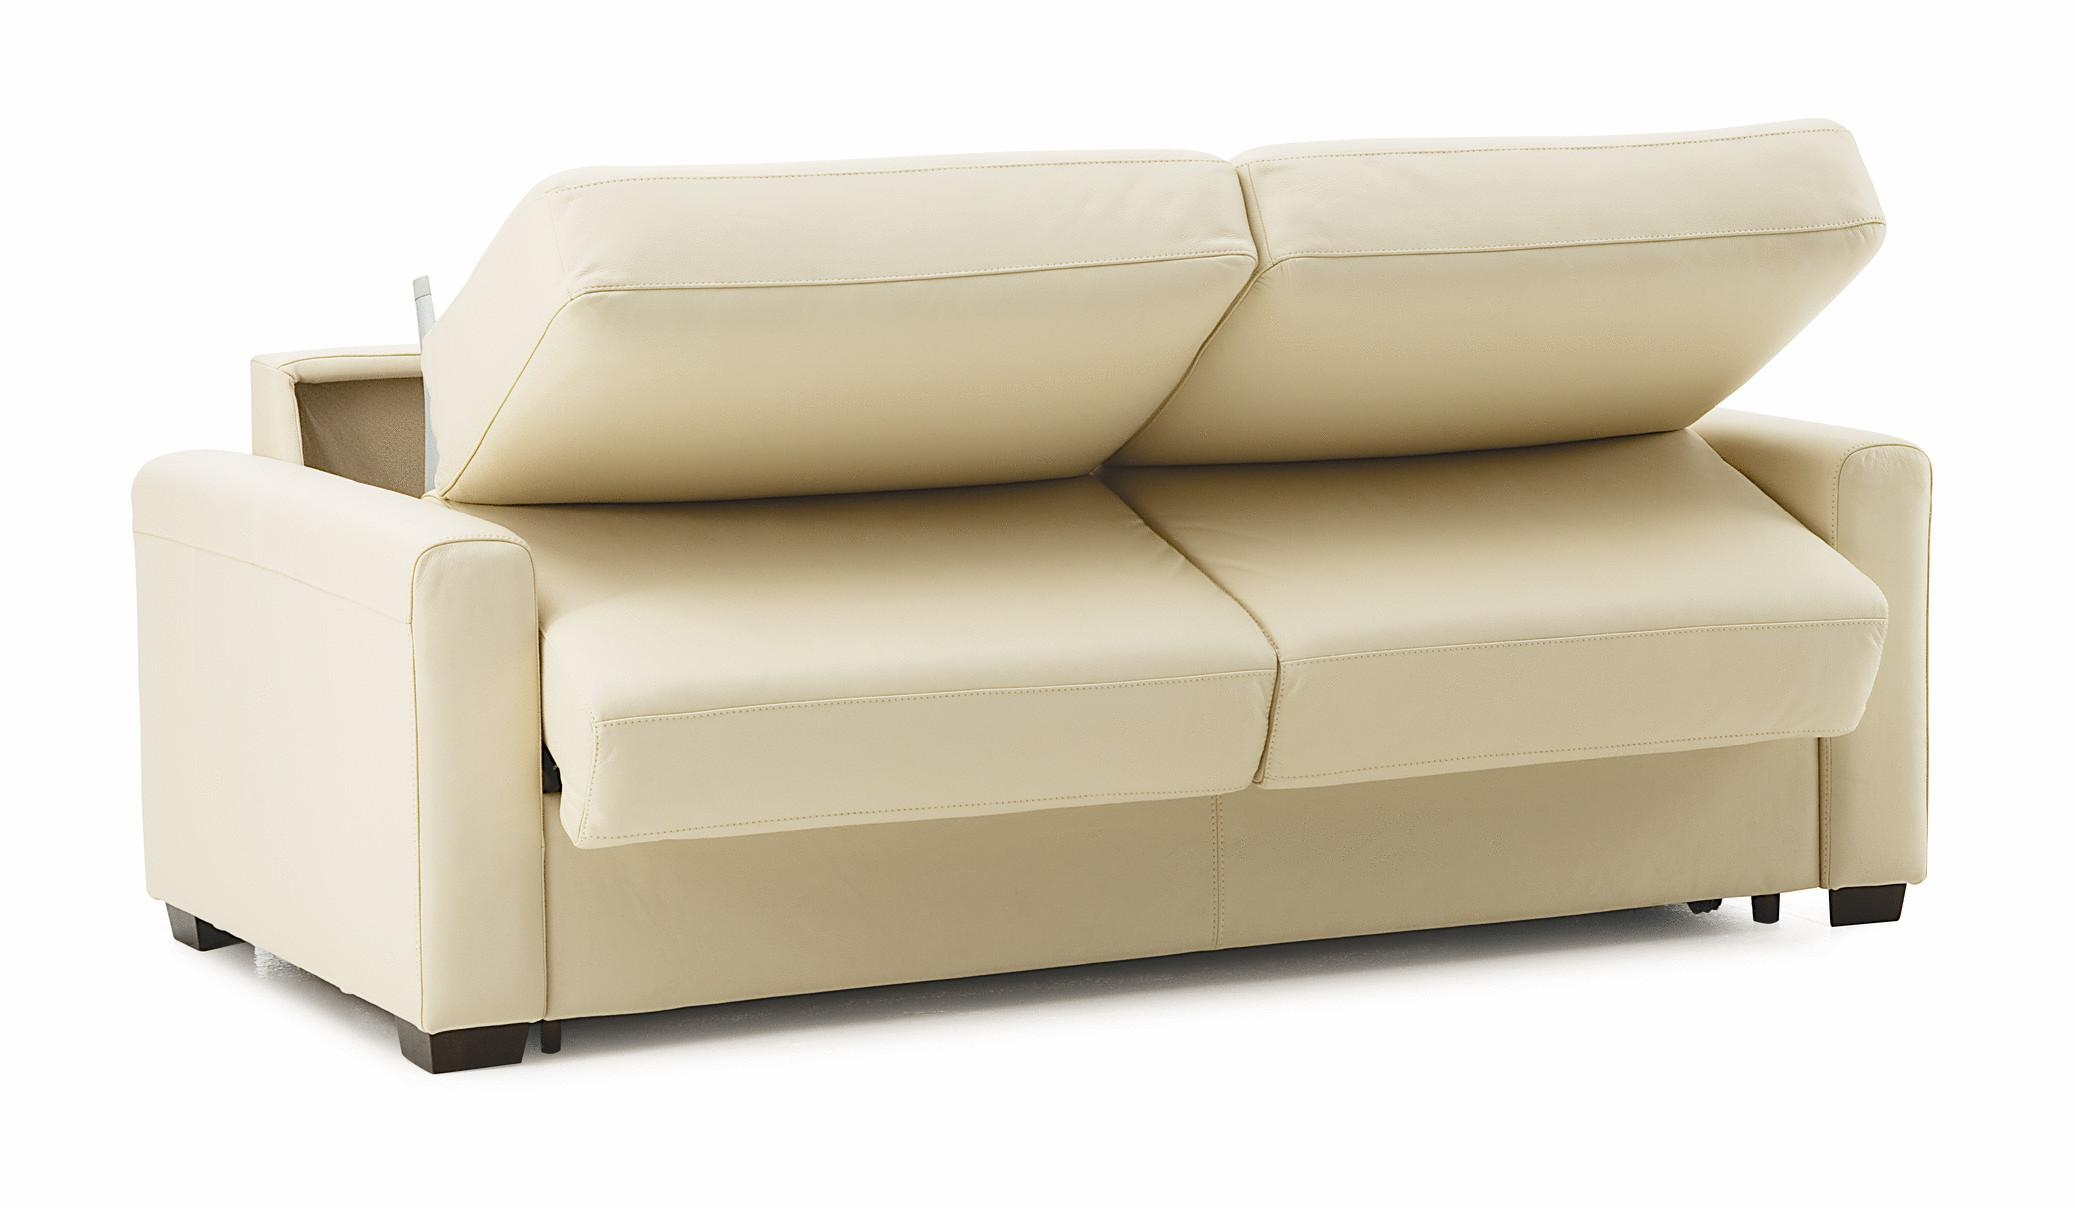 Sleeper Sofa Everyday Use – Page 3 – Webforfreaks Inside Everyday Sleeper Sofas (Image 18 of 20)